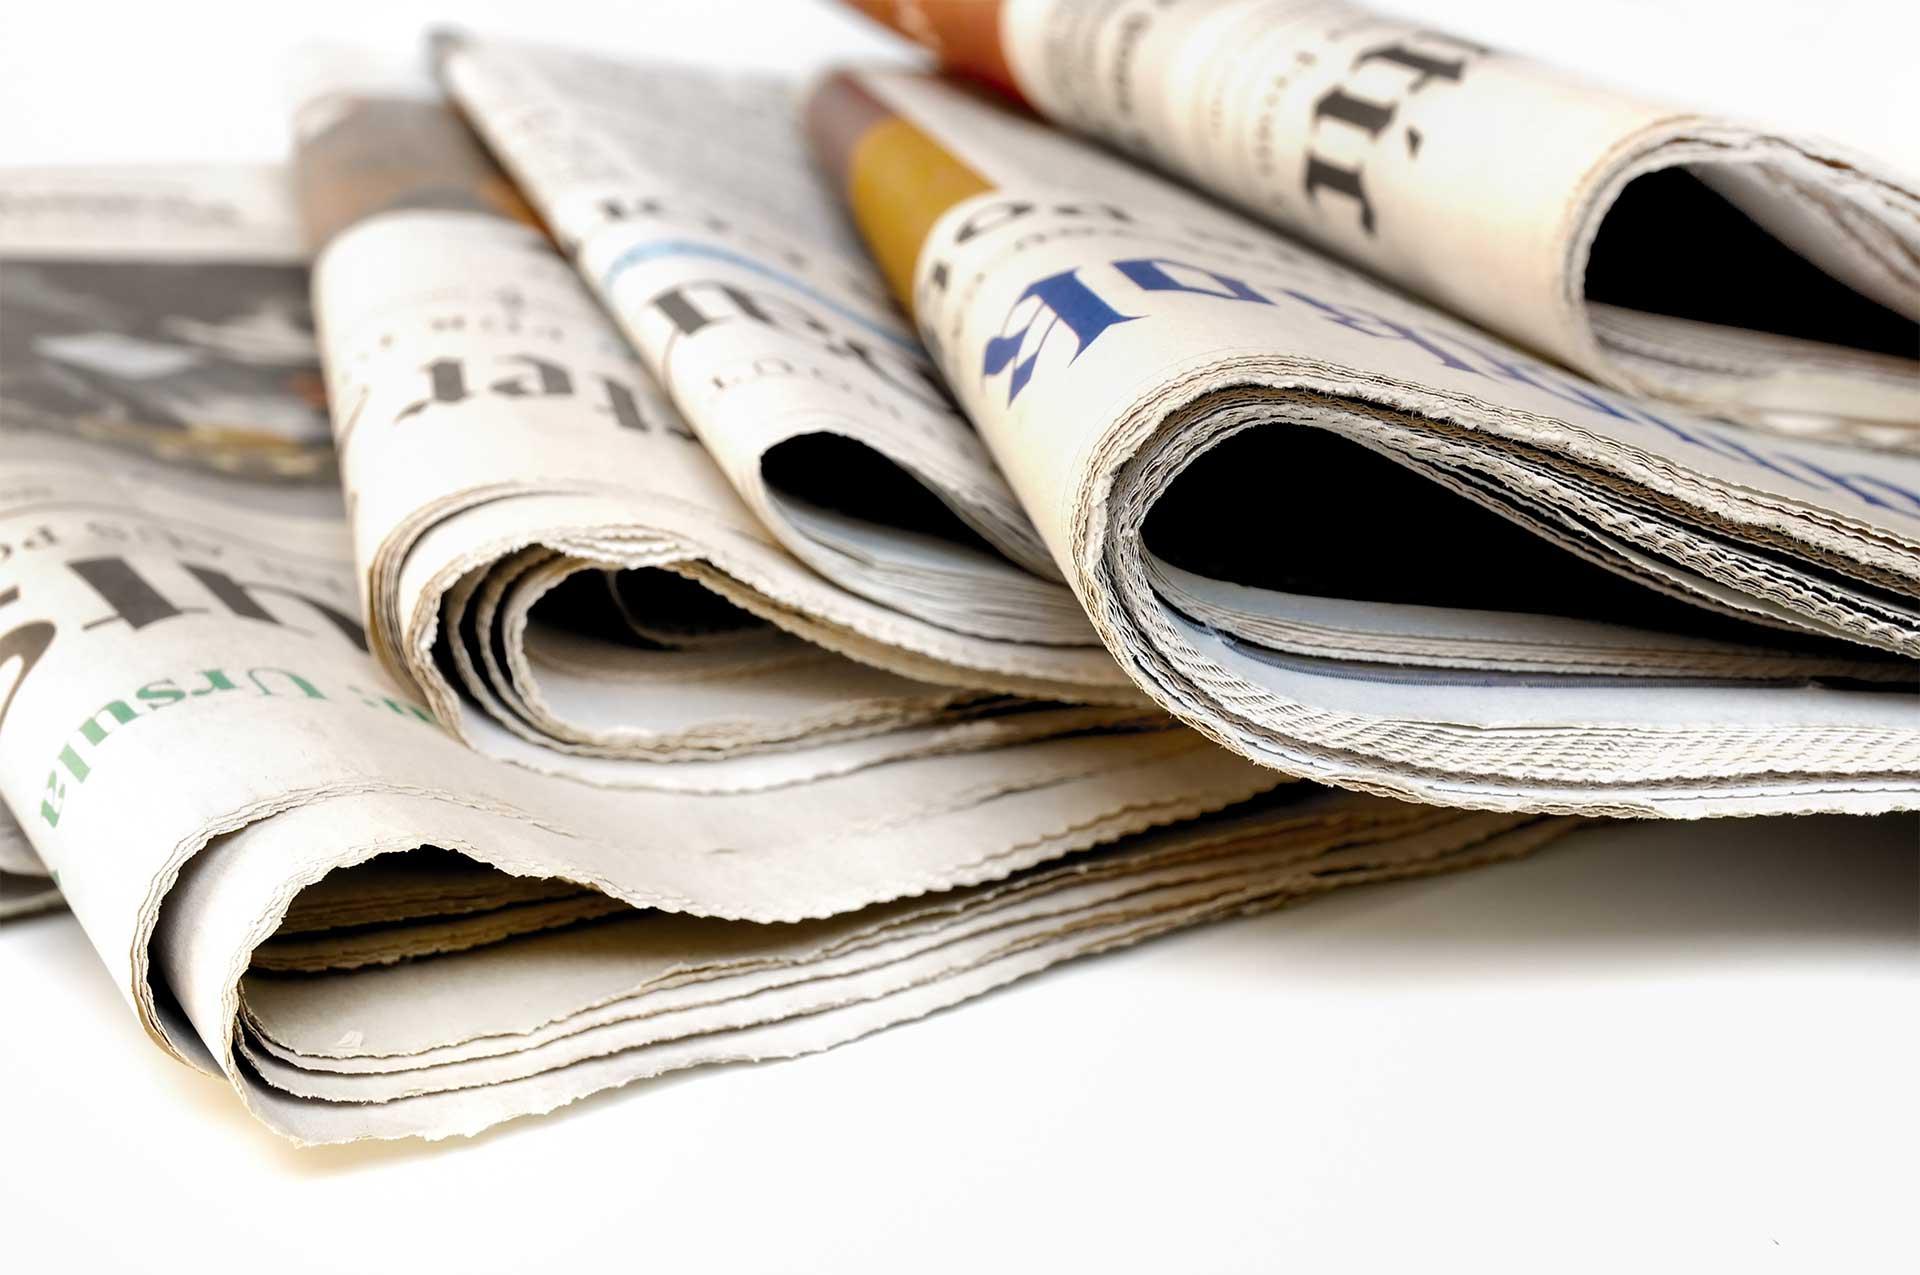 Zeitungsauswahl liegt lesebereit am Schreibtisch